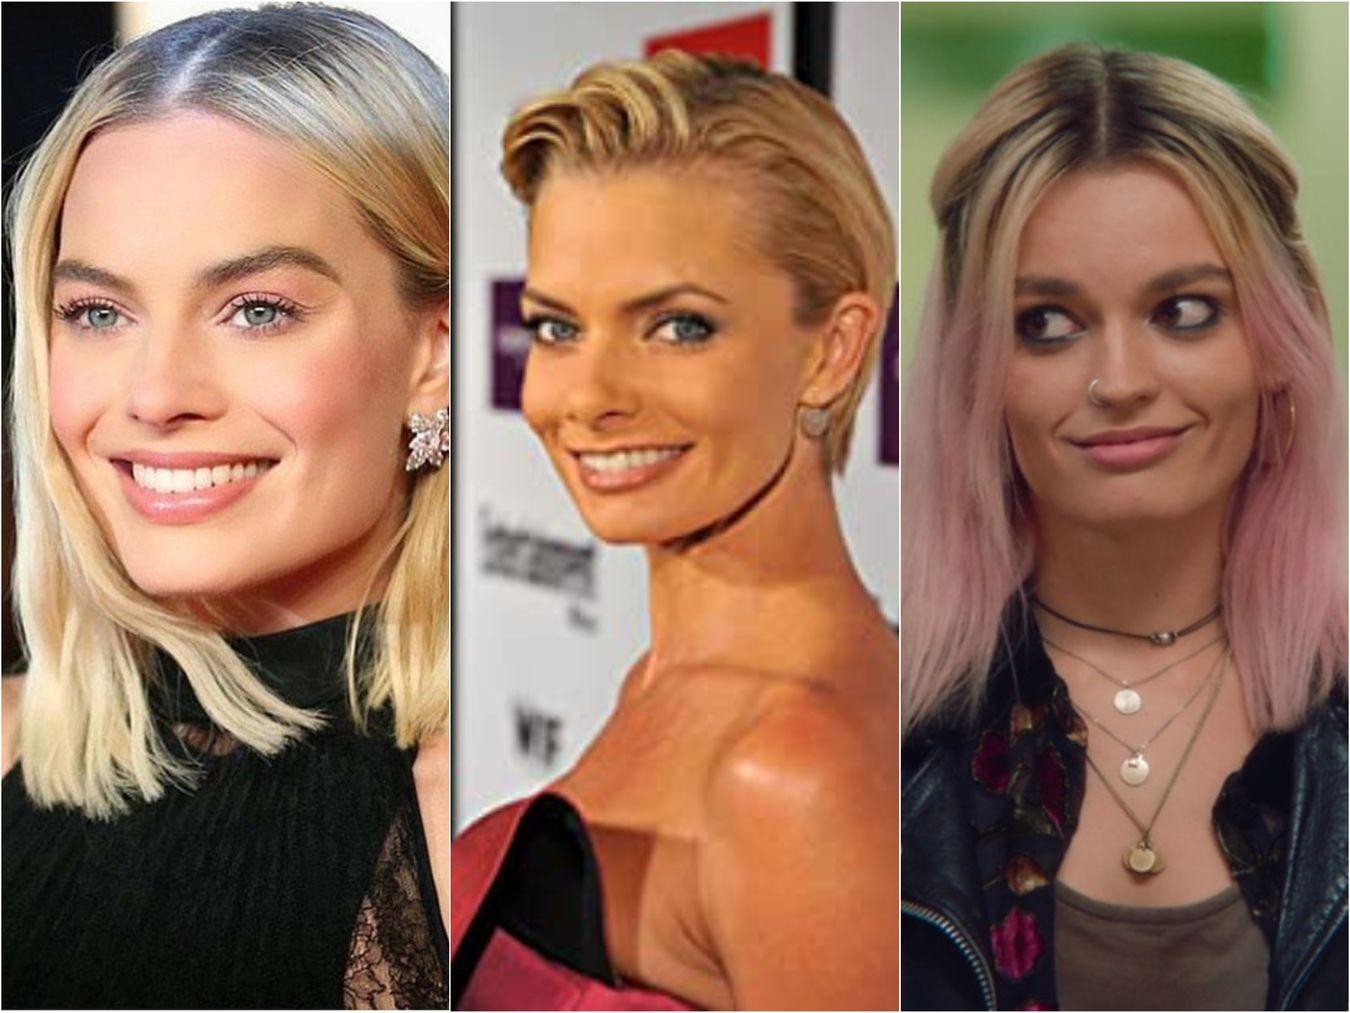 Famous doppelgangers - Jaime Pressly, Margot Robbie, and Emma Mackey